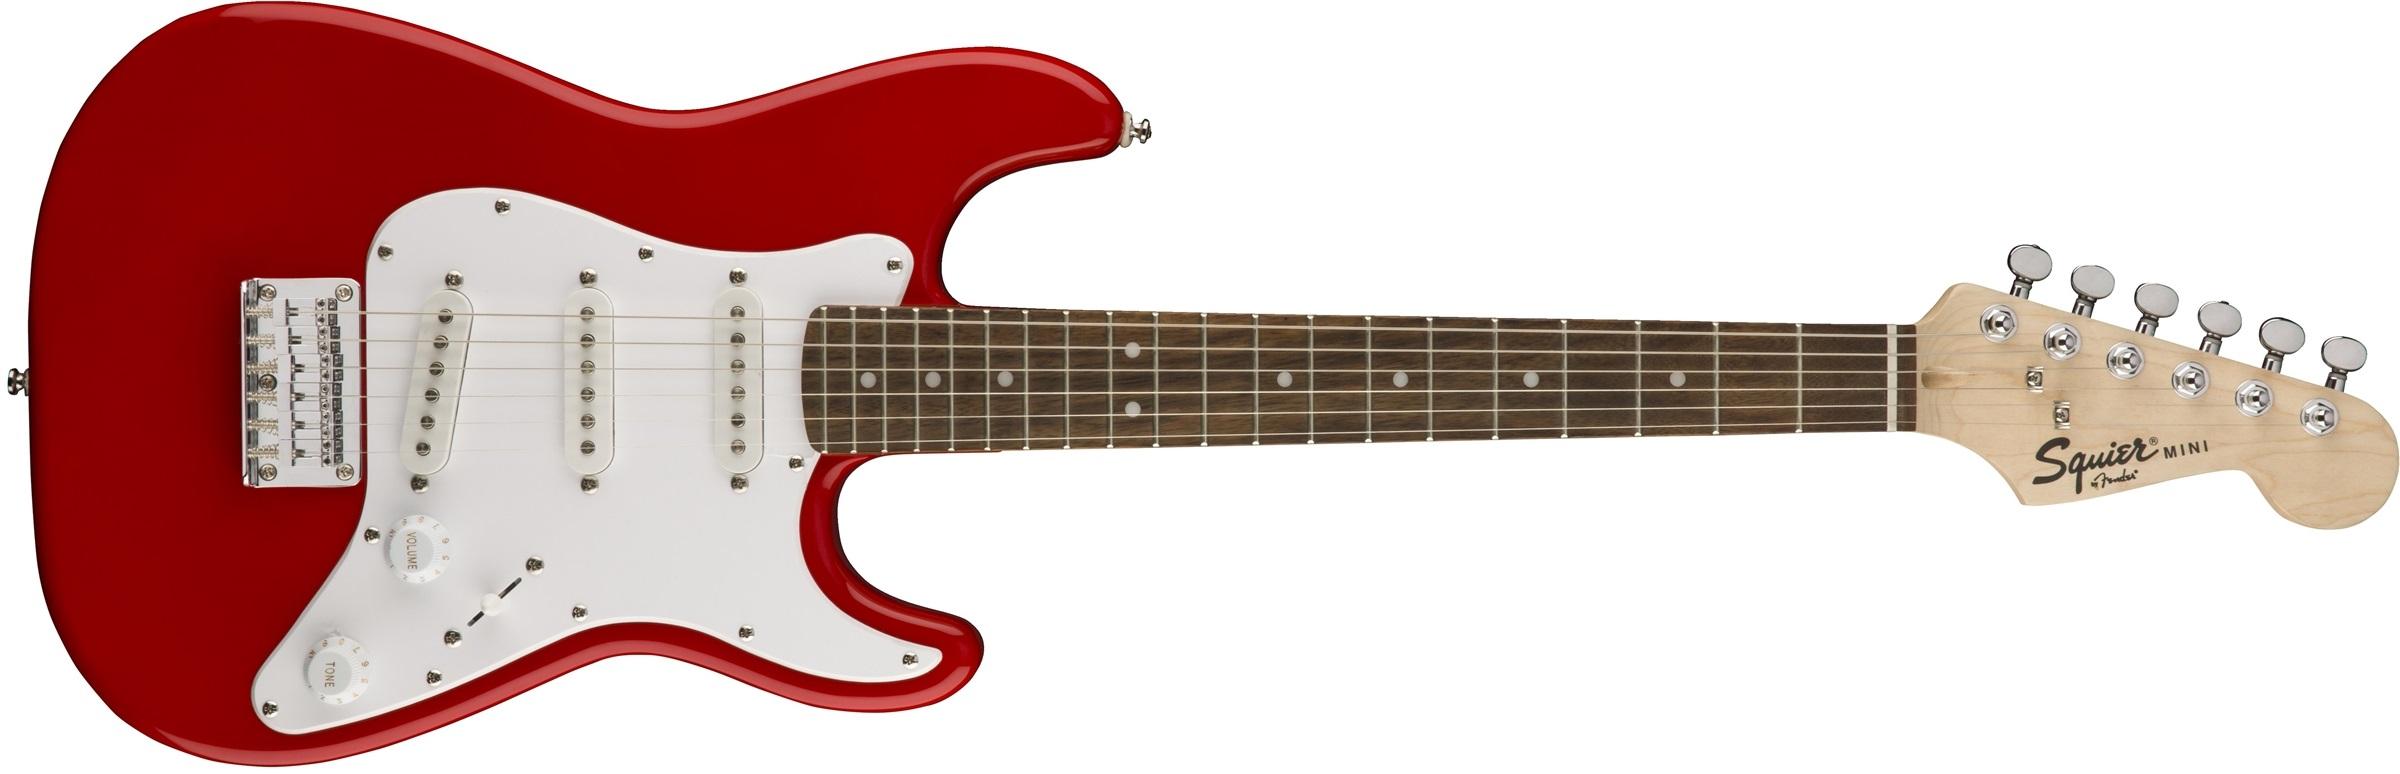 Fender Squier Mini Stratocaster RW TRD